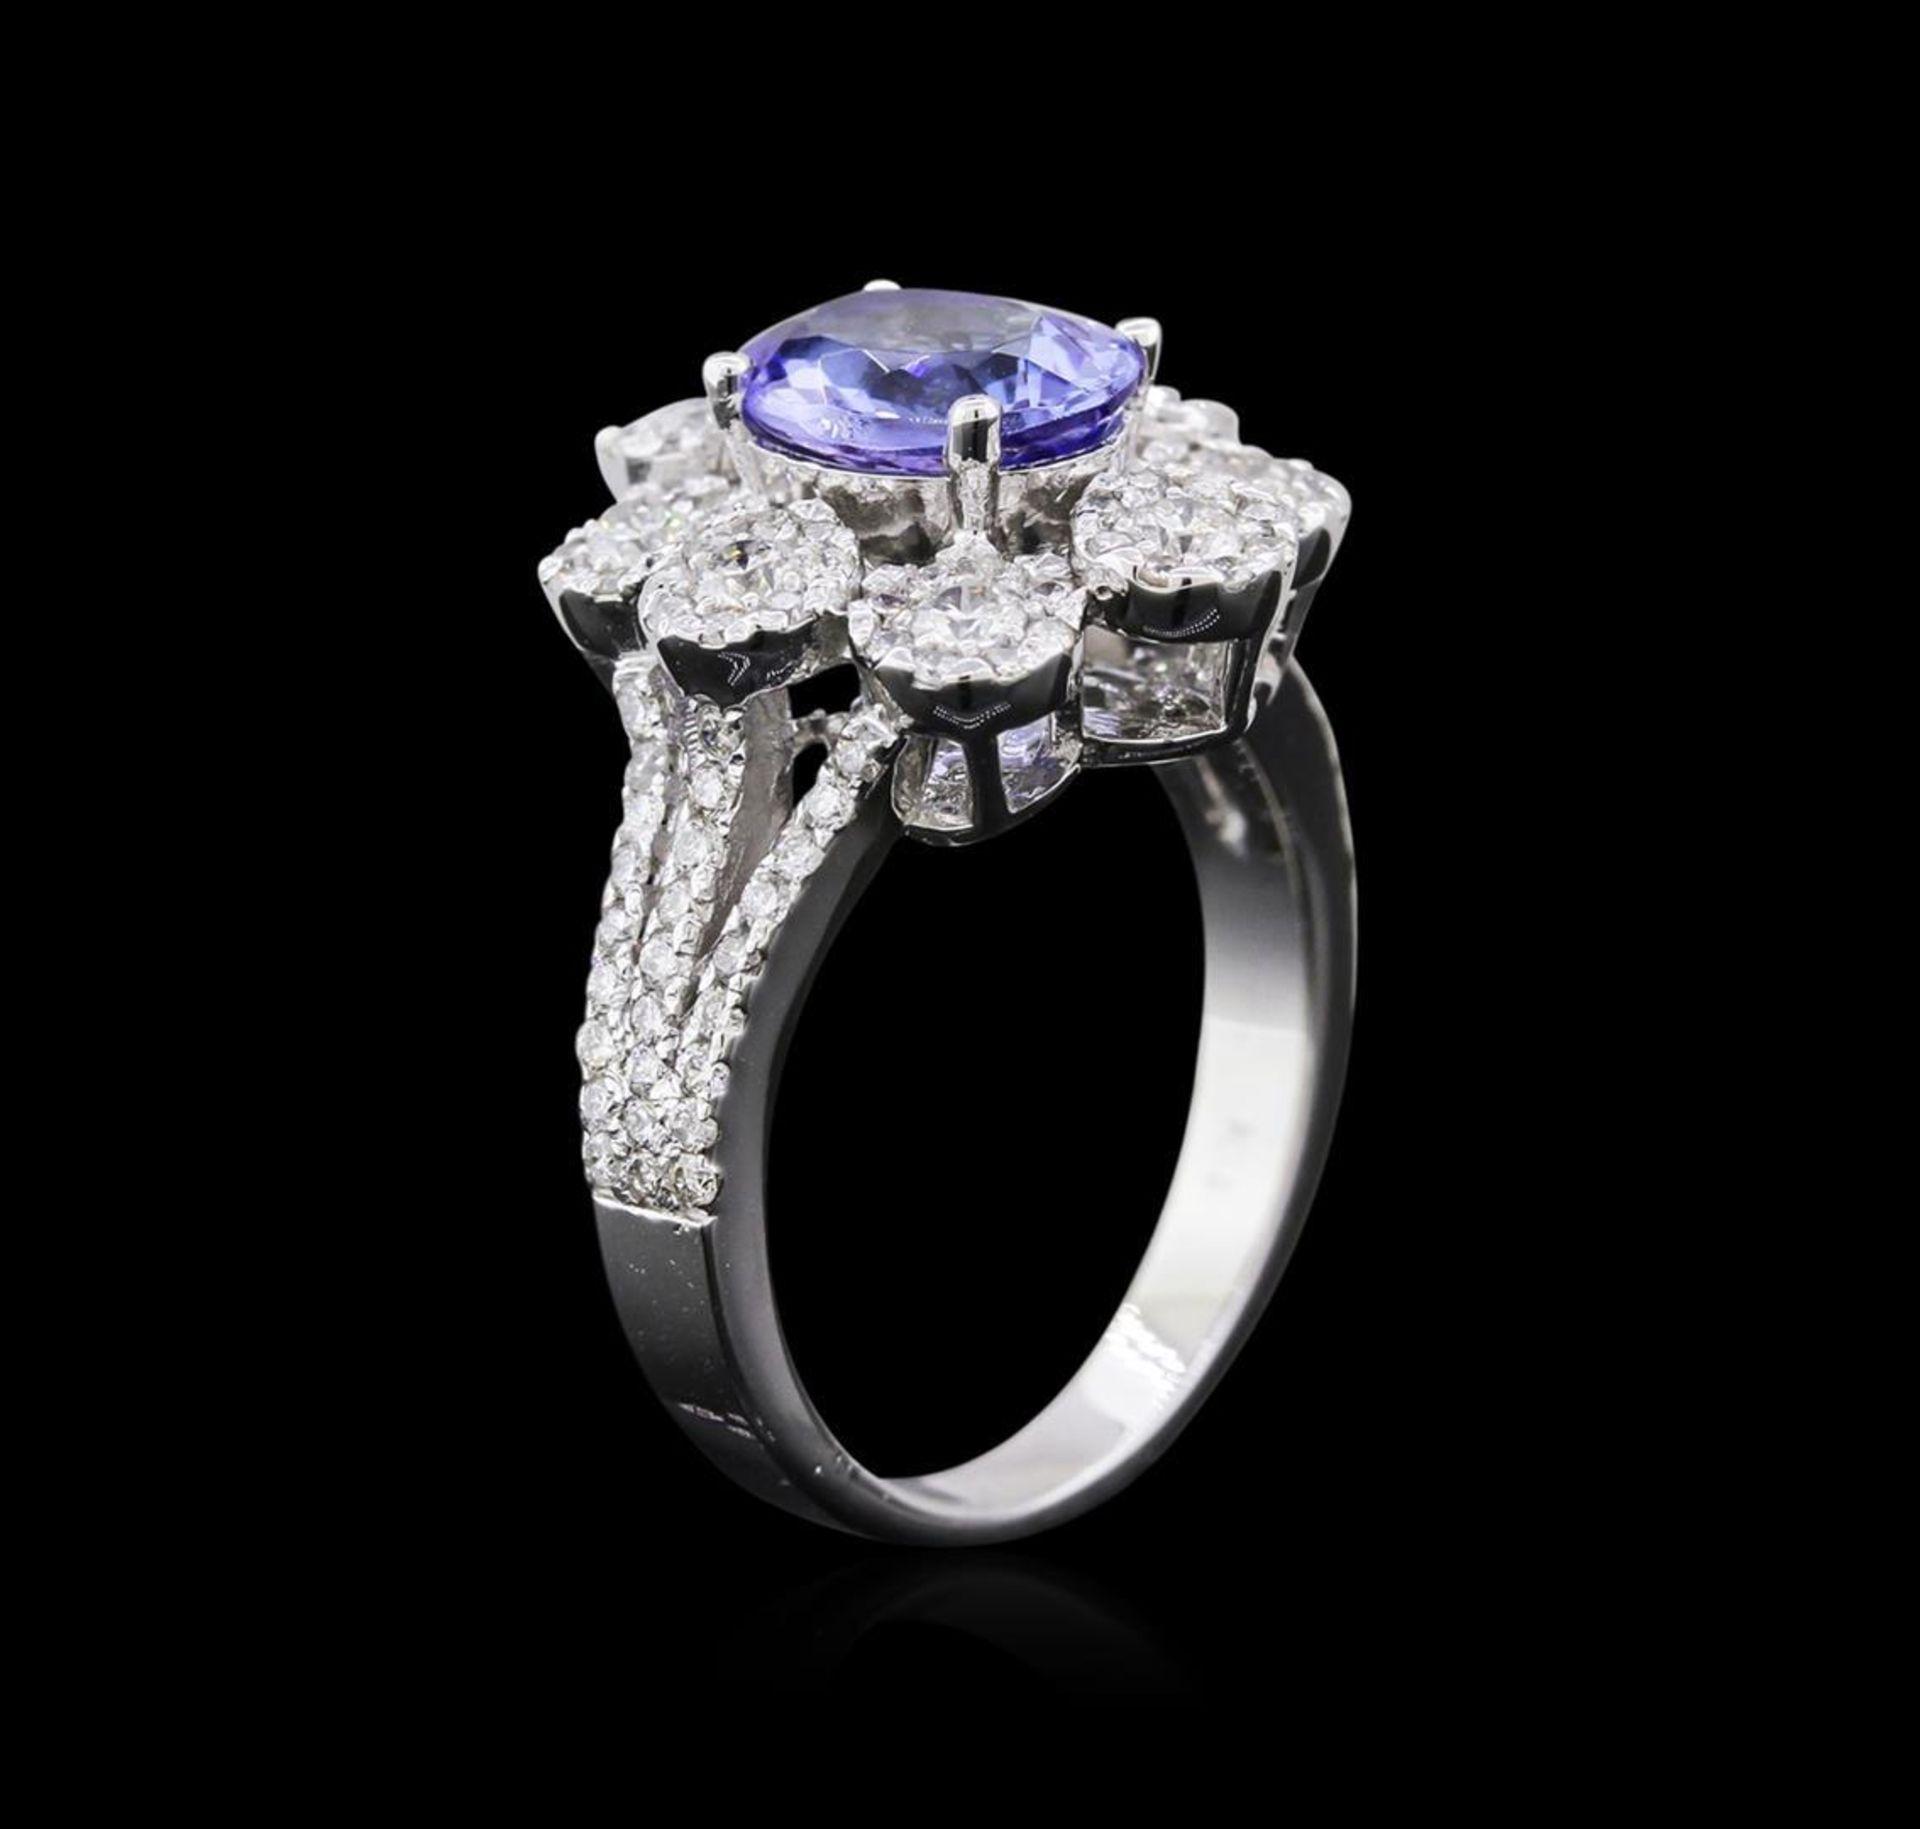 14KT White Gold 2.00 ctw Tanzanite and Diamond Ring - Image 3 of 4